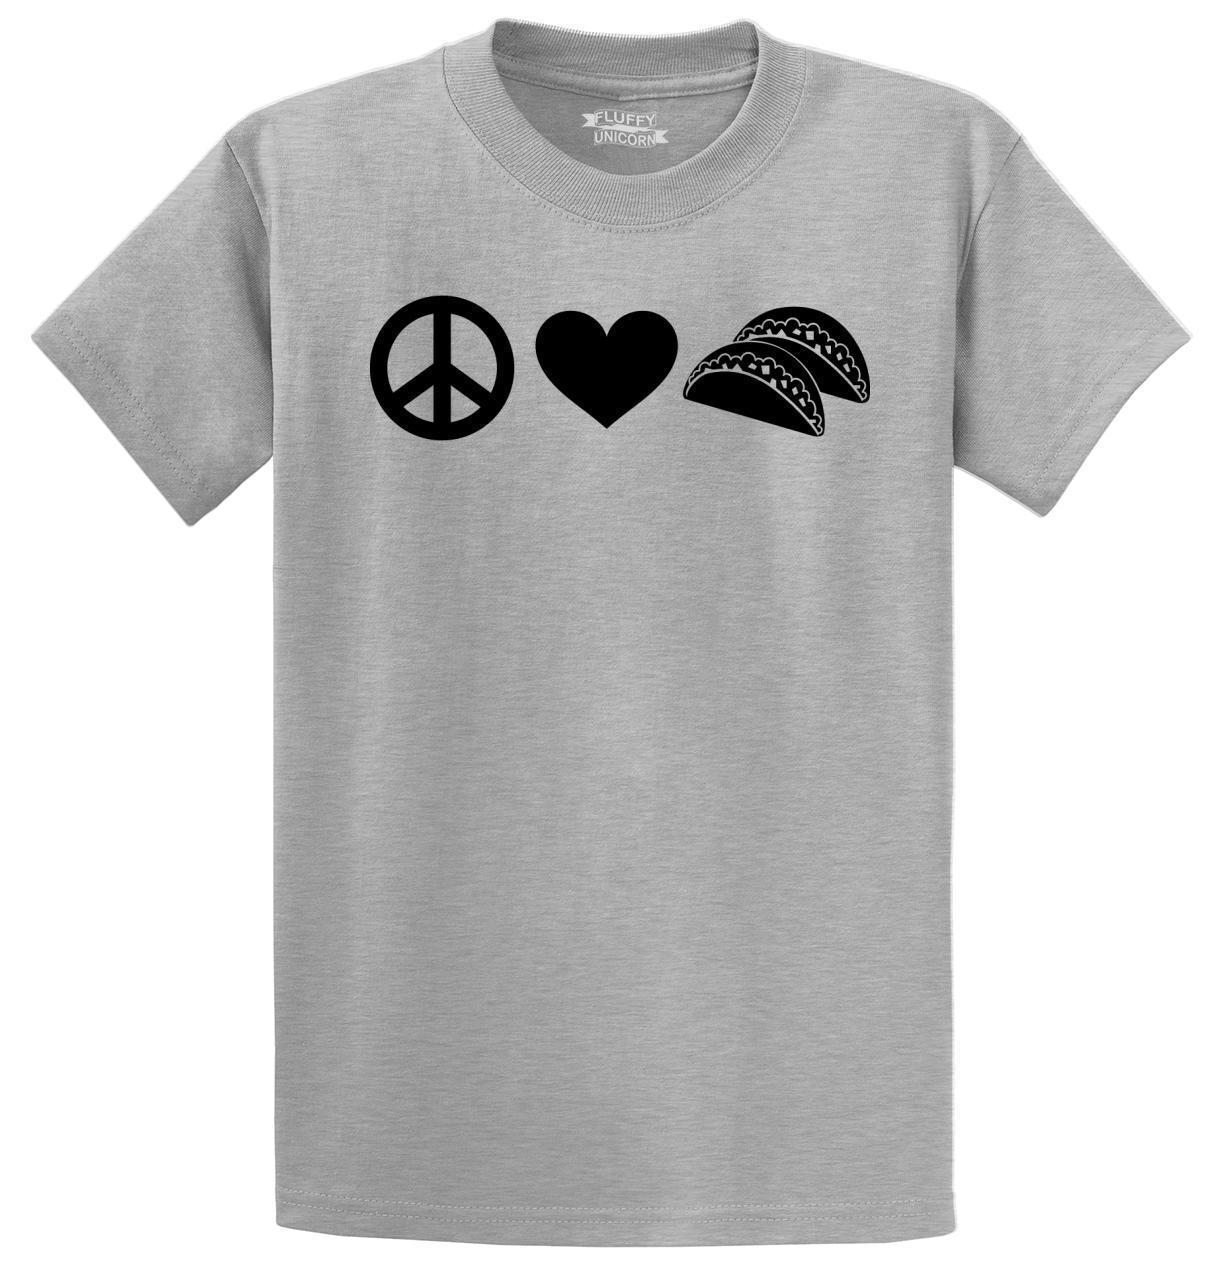 802bcc7f Mens Peace Love Tacos T Shirt Food Party Hippie Shirt Men Women Unisex  Fashion Tshirt Printing Tee Shirts Cool Funny T Shirts From  Designprinttshirts05, ...